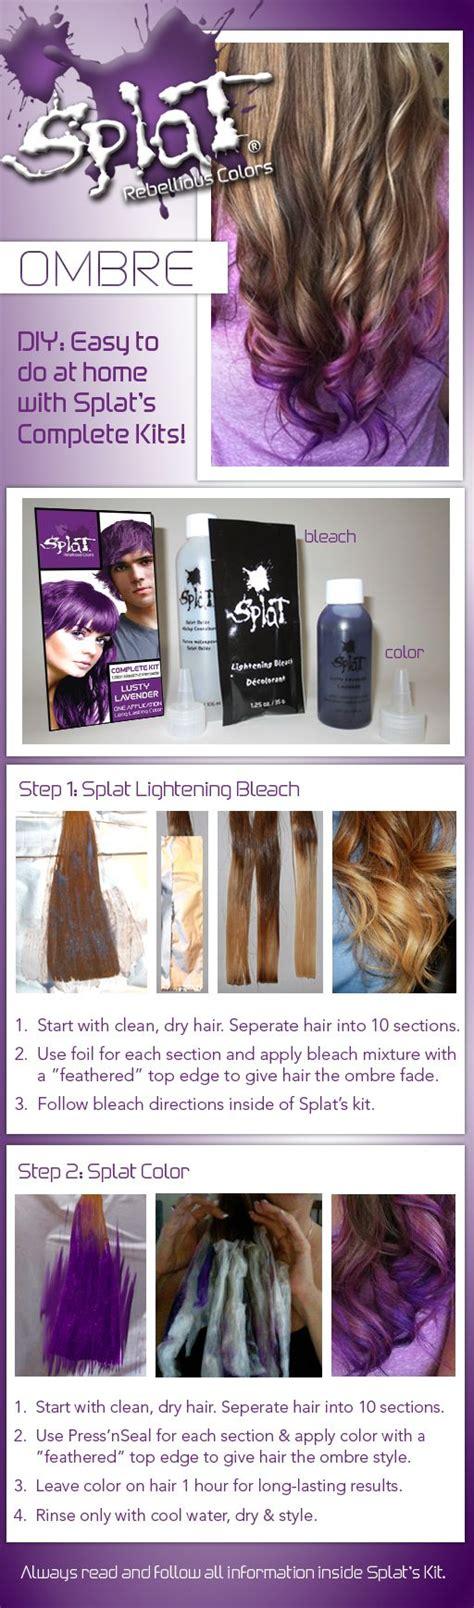 splat hair color ideas splat ombre dip dye diy splat hair color ideas